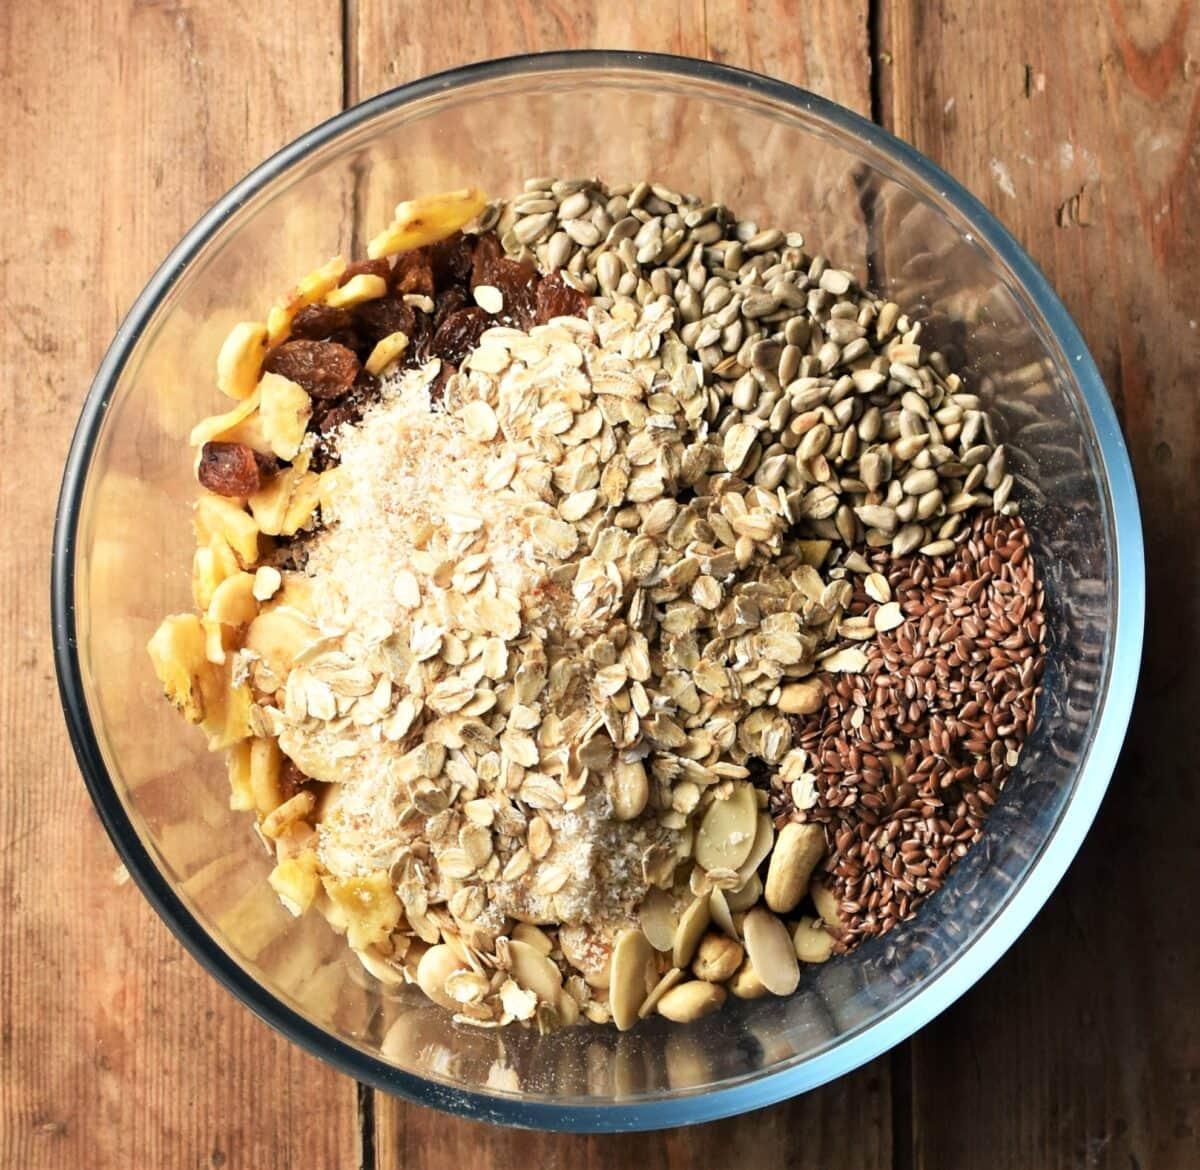 Muesli ingredients in mixing bowl.